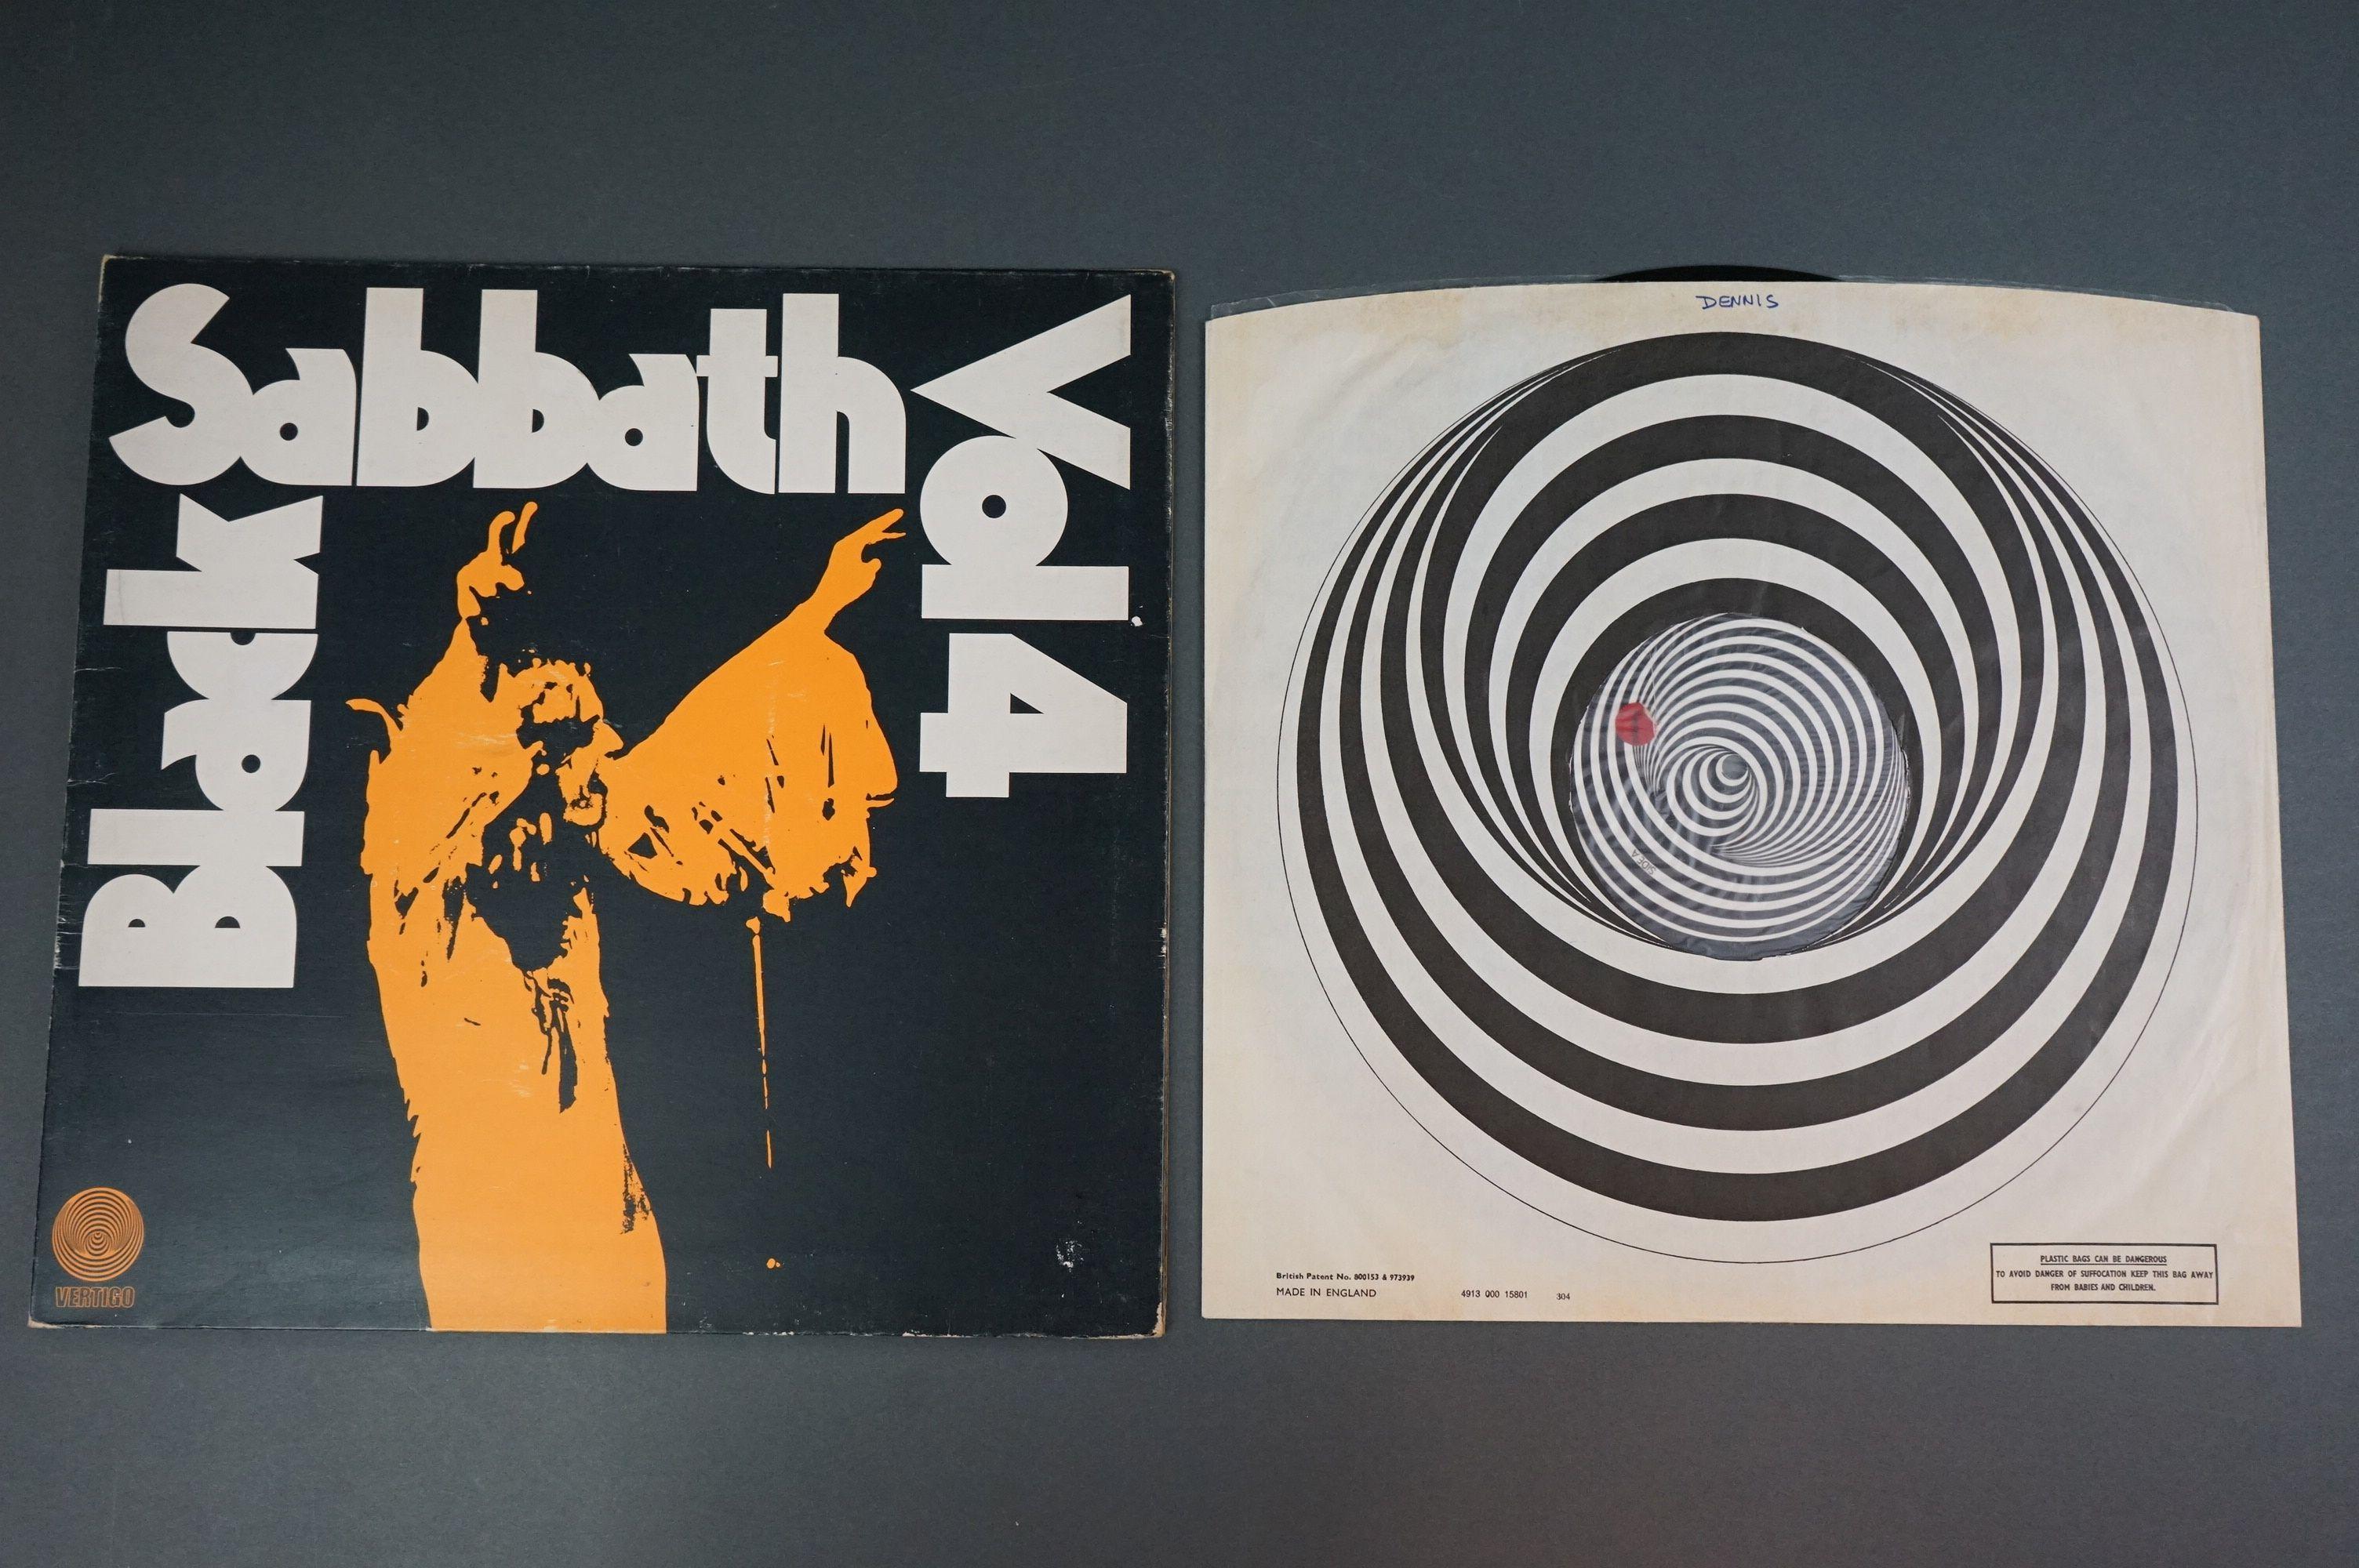 Vinyl - Black Sabbath vol 4 6360071 on Vertigo 1st pressing, no 'made in England' to label, gatefold - Image 3 of 6